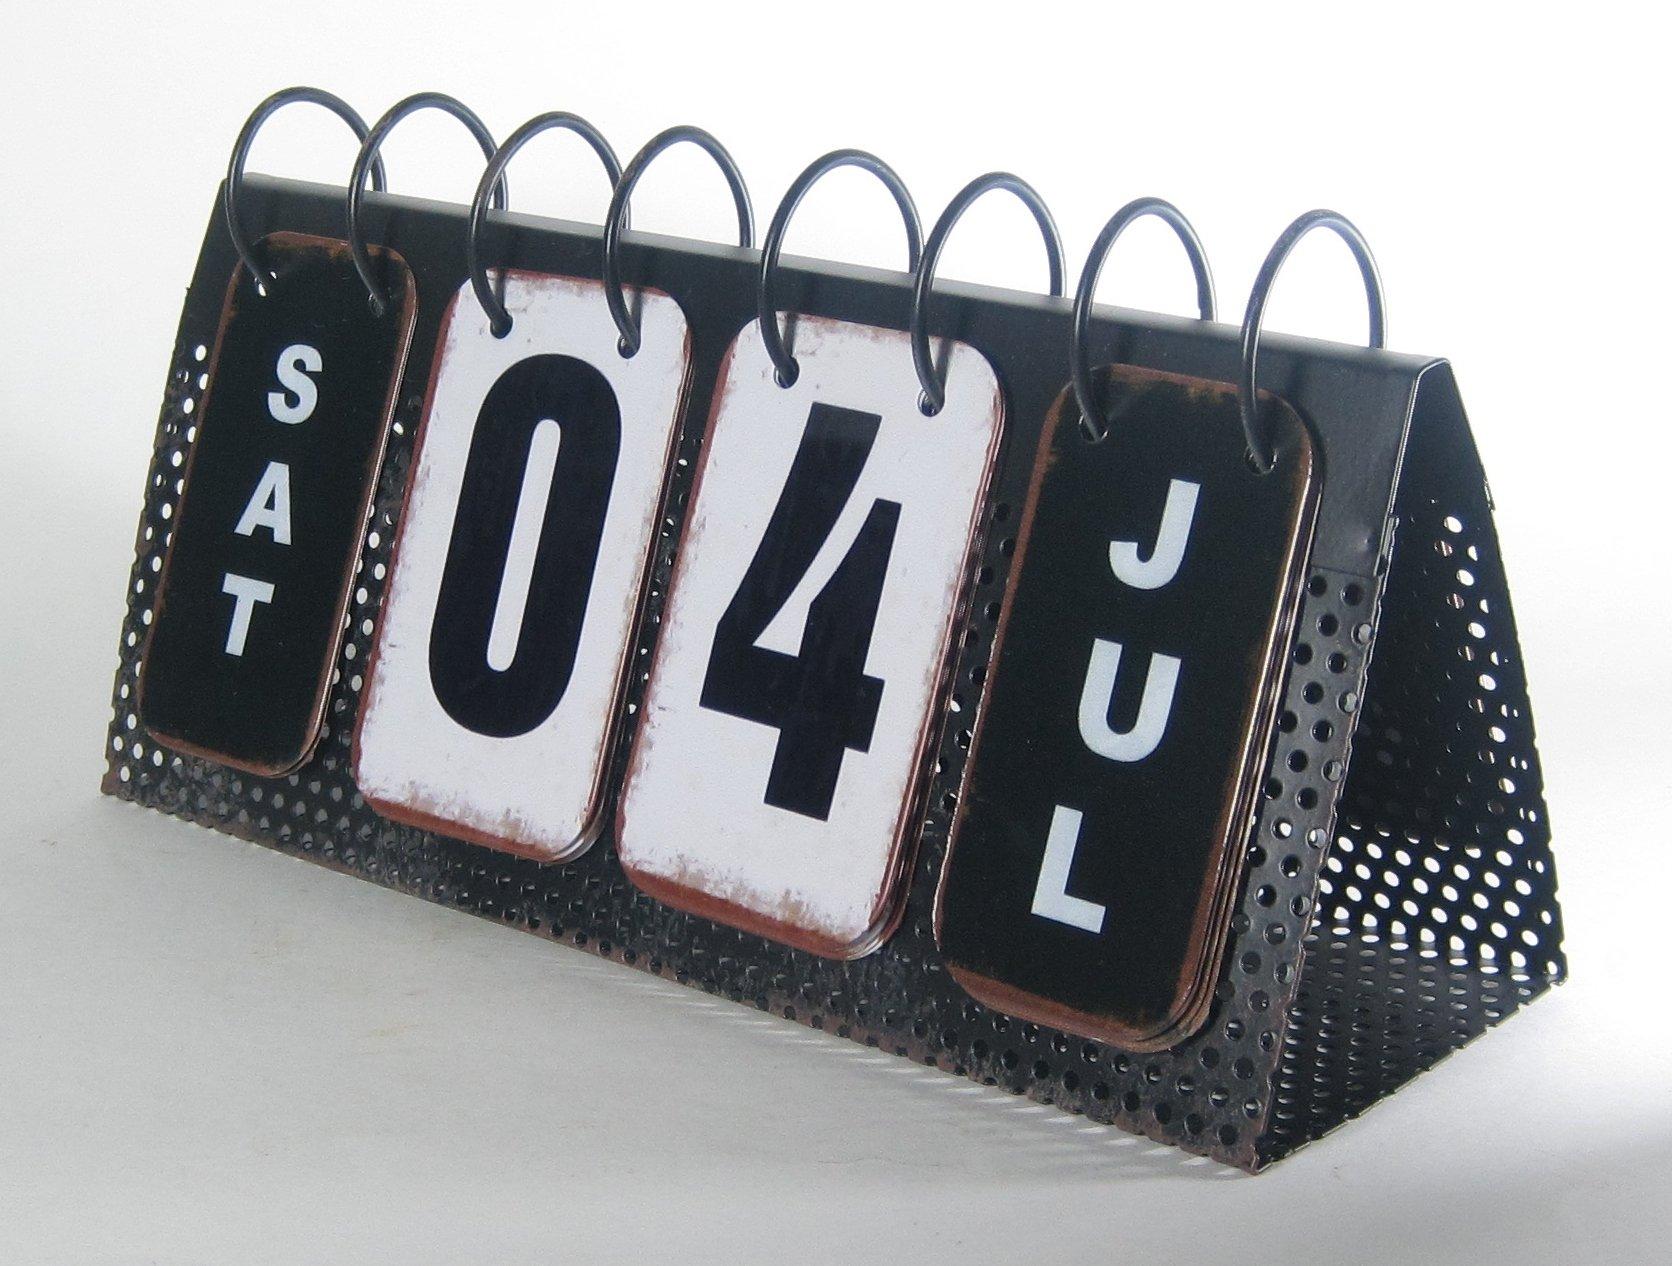 Metal Spiral Flip Perpetual Calendar Eclectic Antique Style Desktop Tabletop 10.75'' x 5.5''